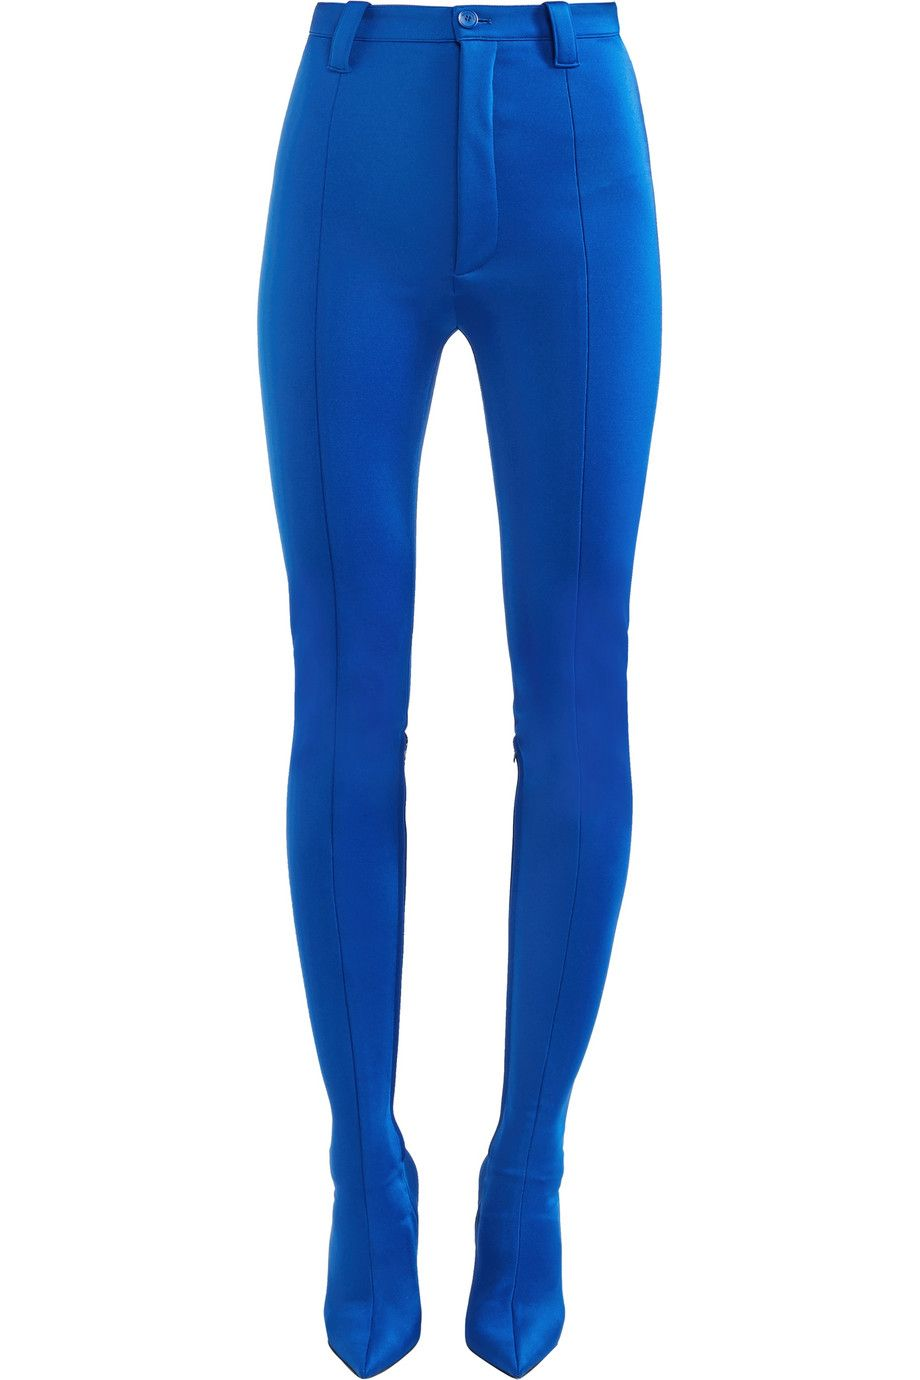 Net-A-Porter x Balenciaga Pantashoe spandex skinny pants